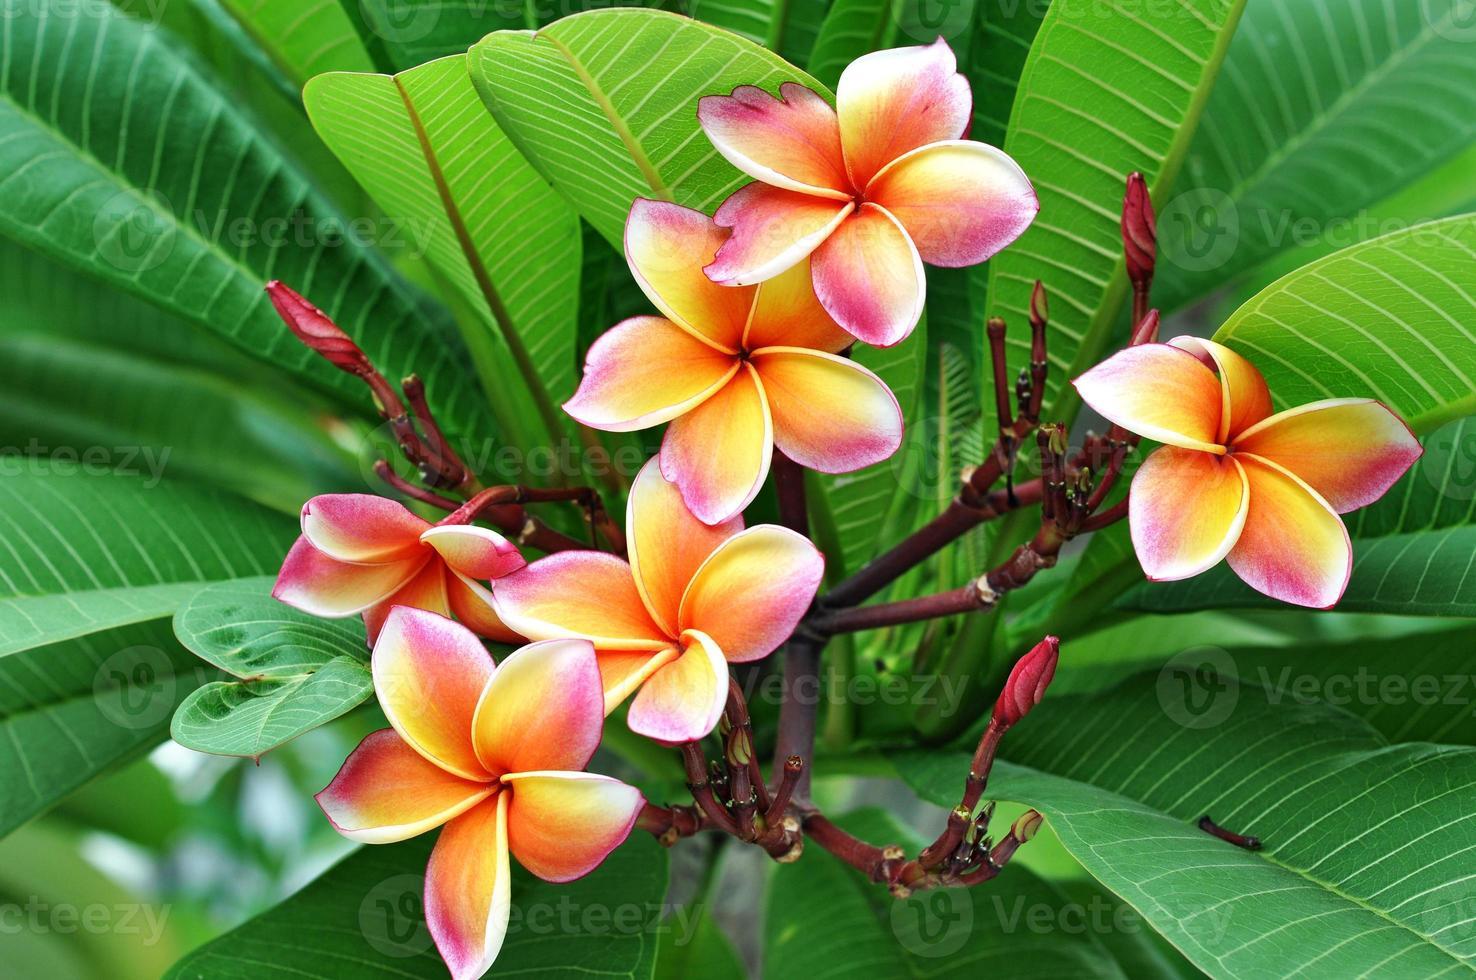 gruppo di fiori di frangipani in fiore foto